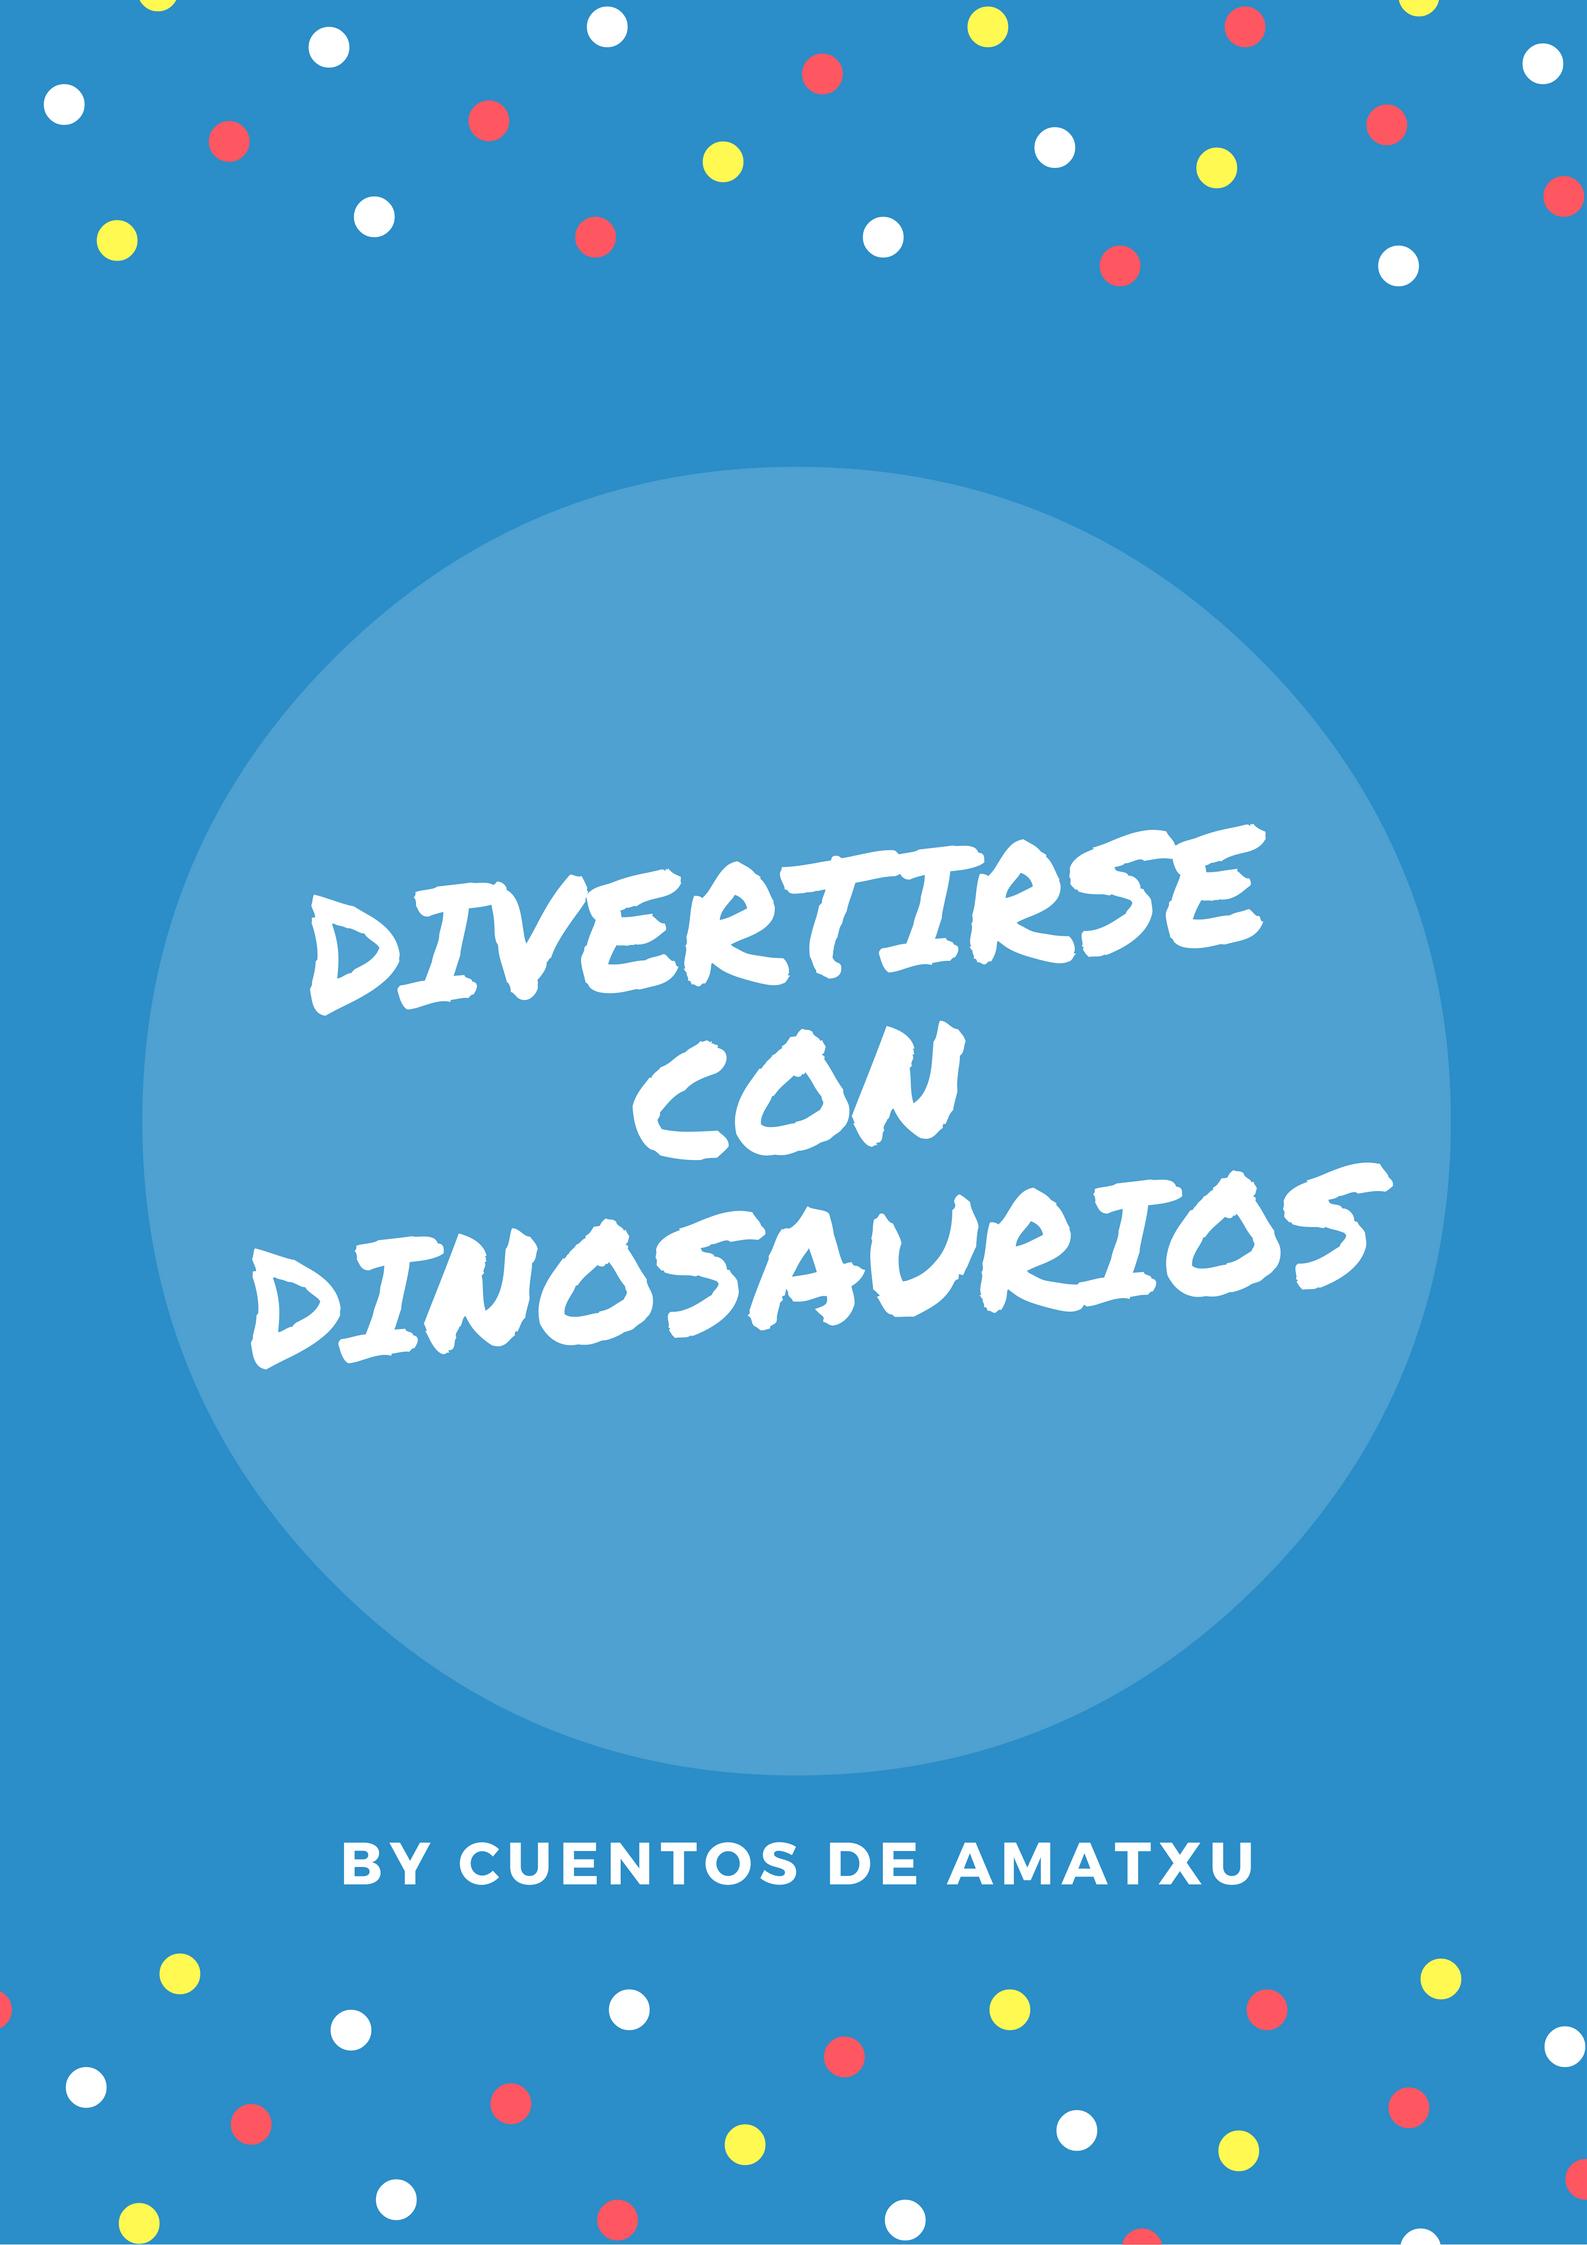 Divertirse con dinosaurios.